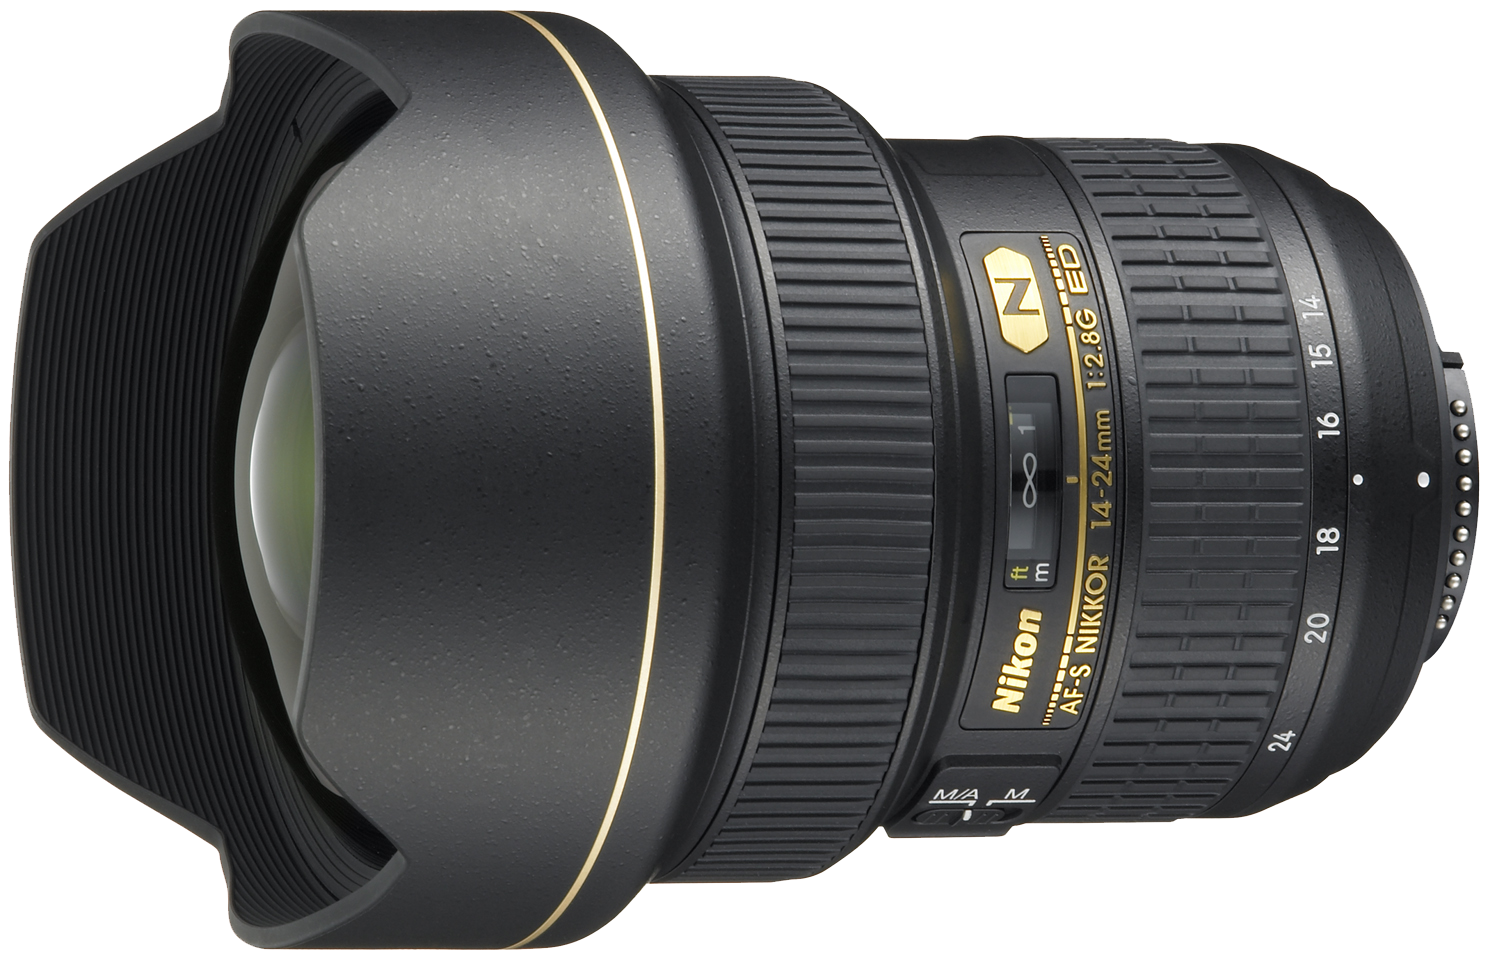 Nikon AF-S 14-24mm f/2.8G ED N(Nano Crystal) – 80 RON